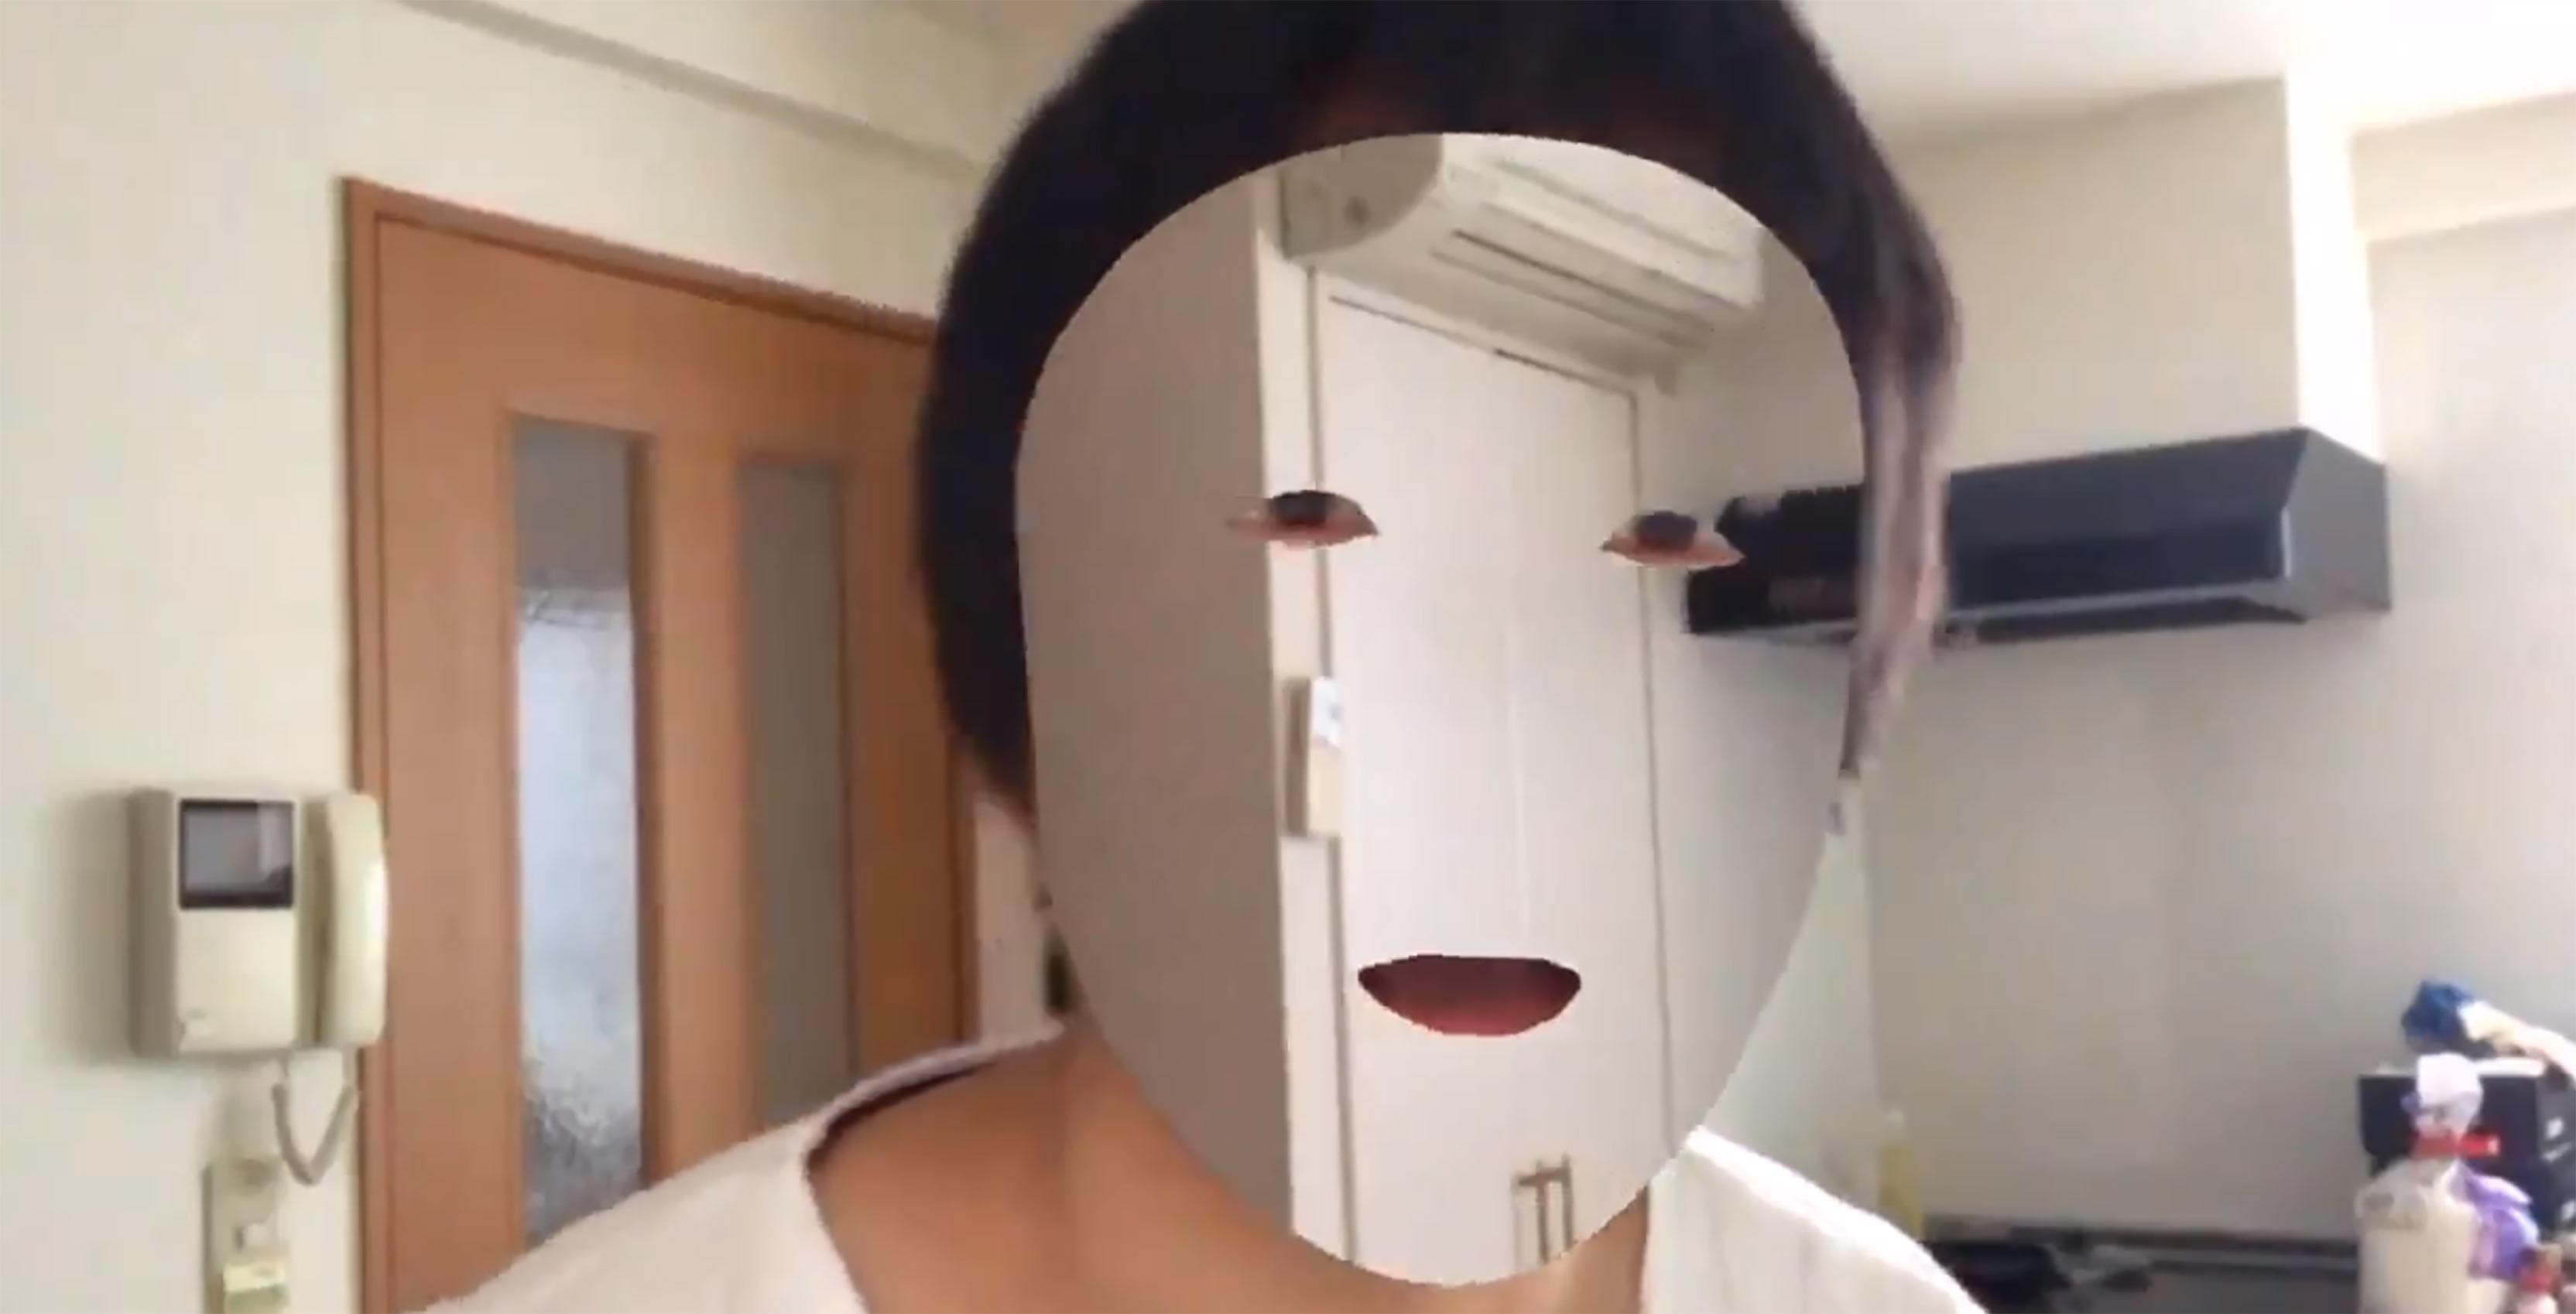 App that hides faces developed by Kazuya Noshiro